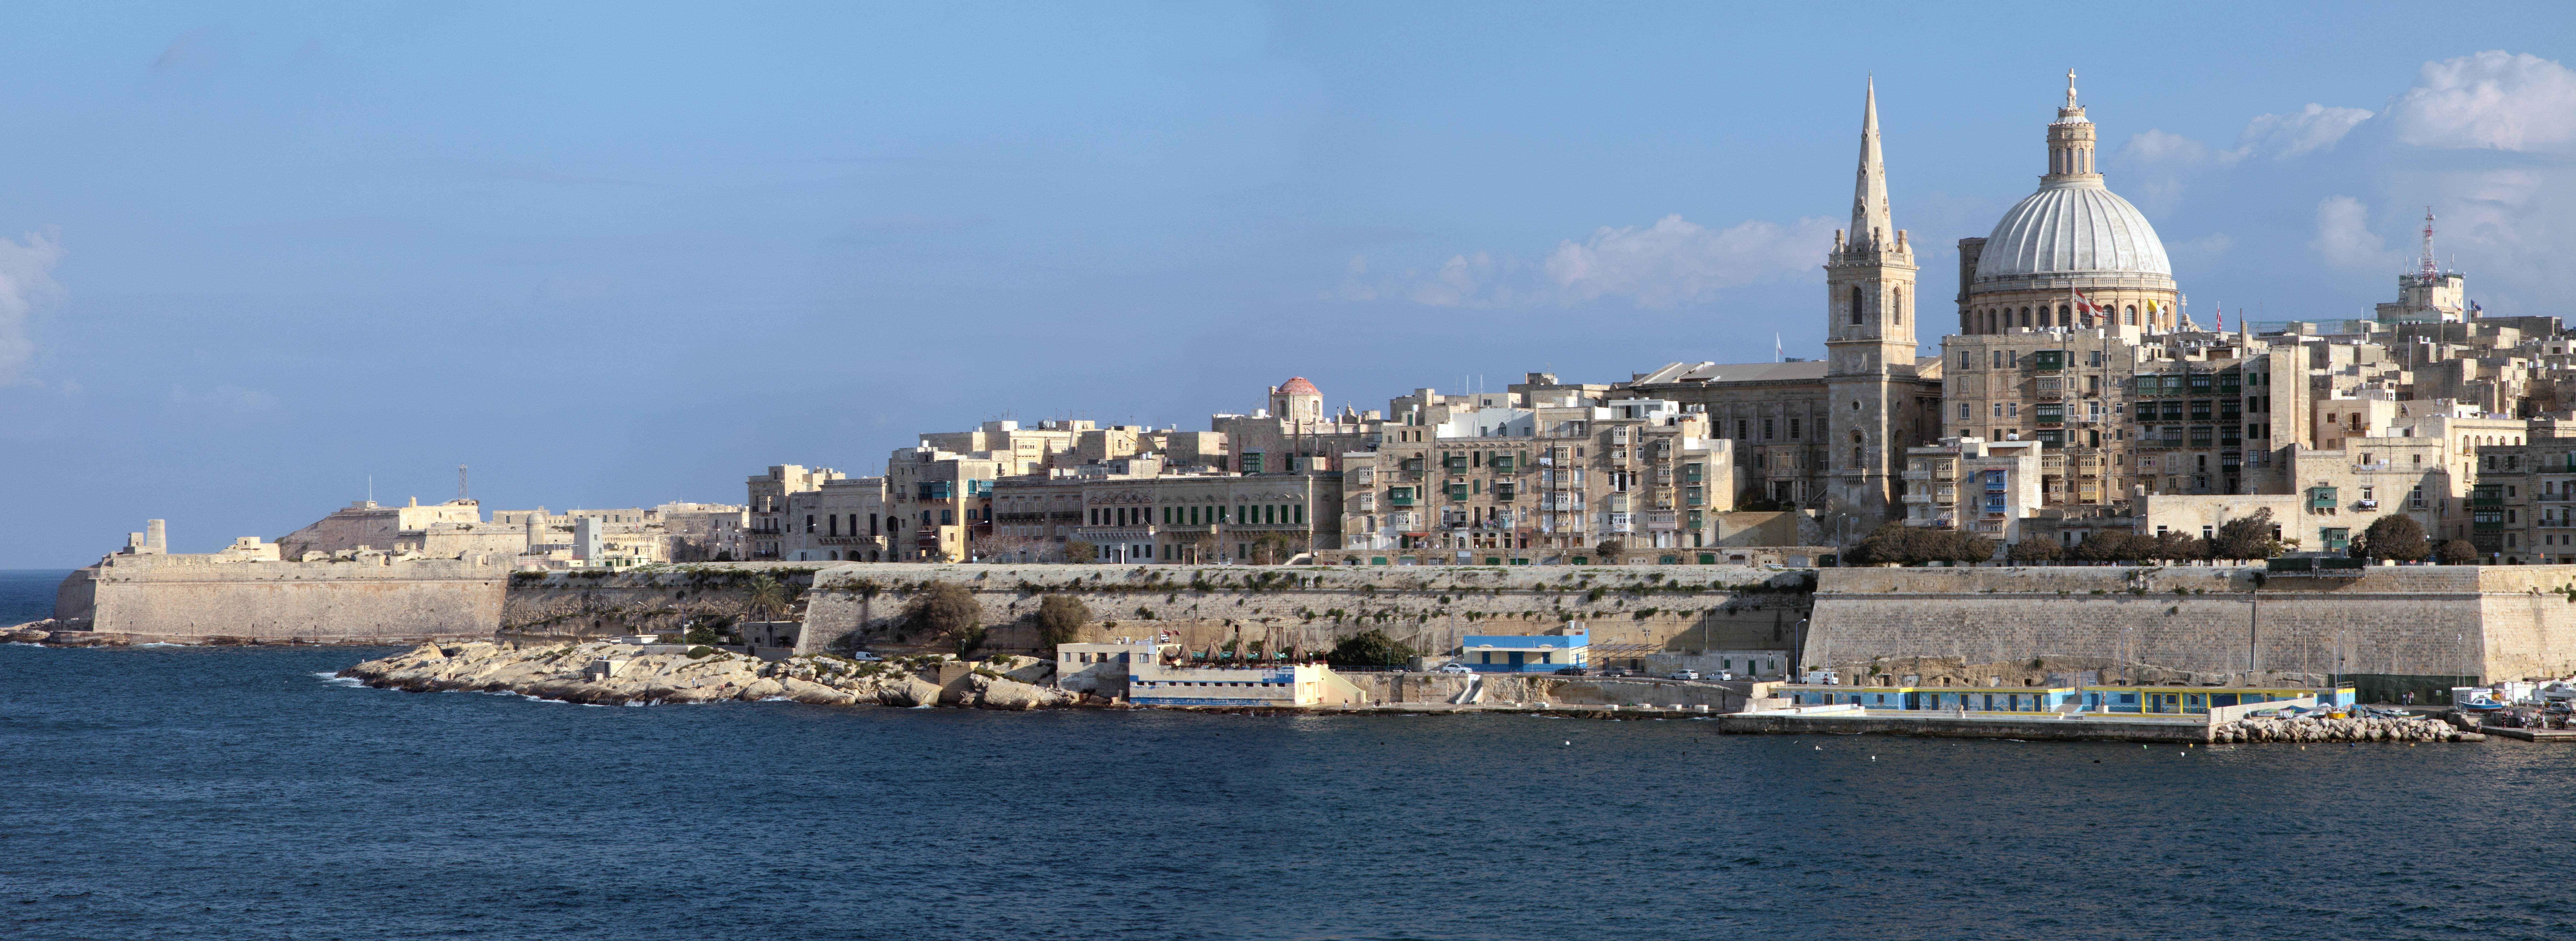 Estudiar en Malta